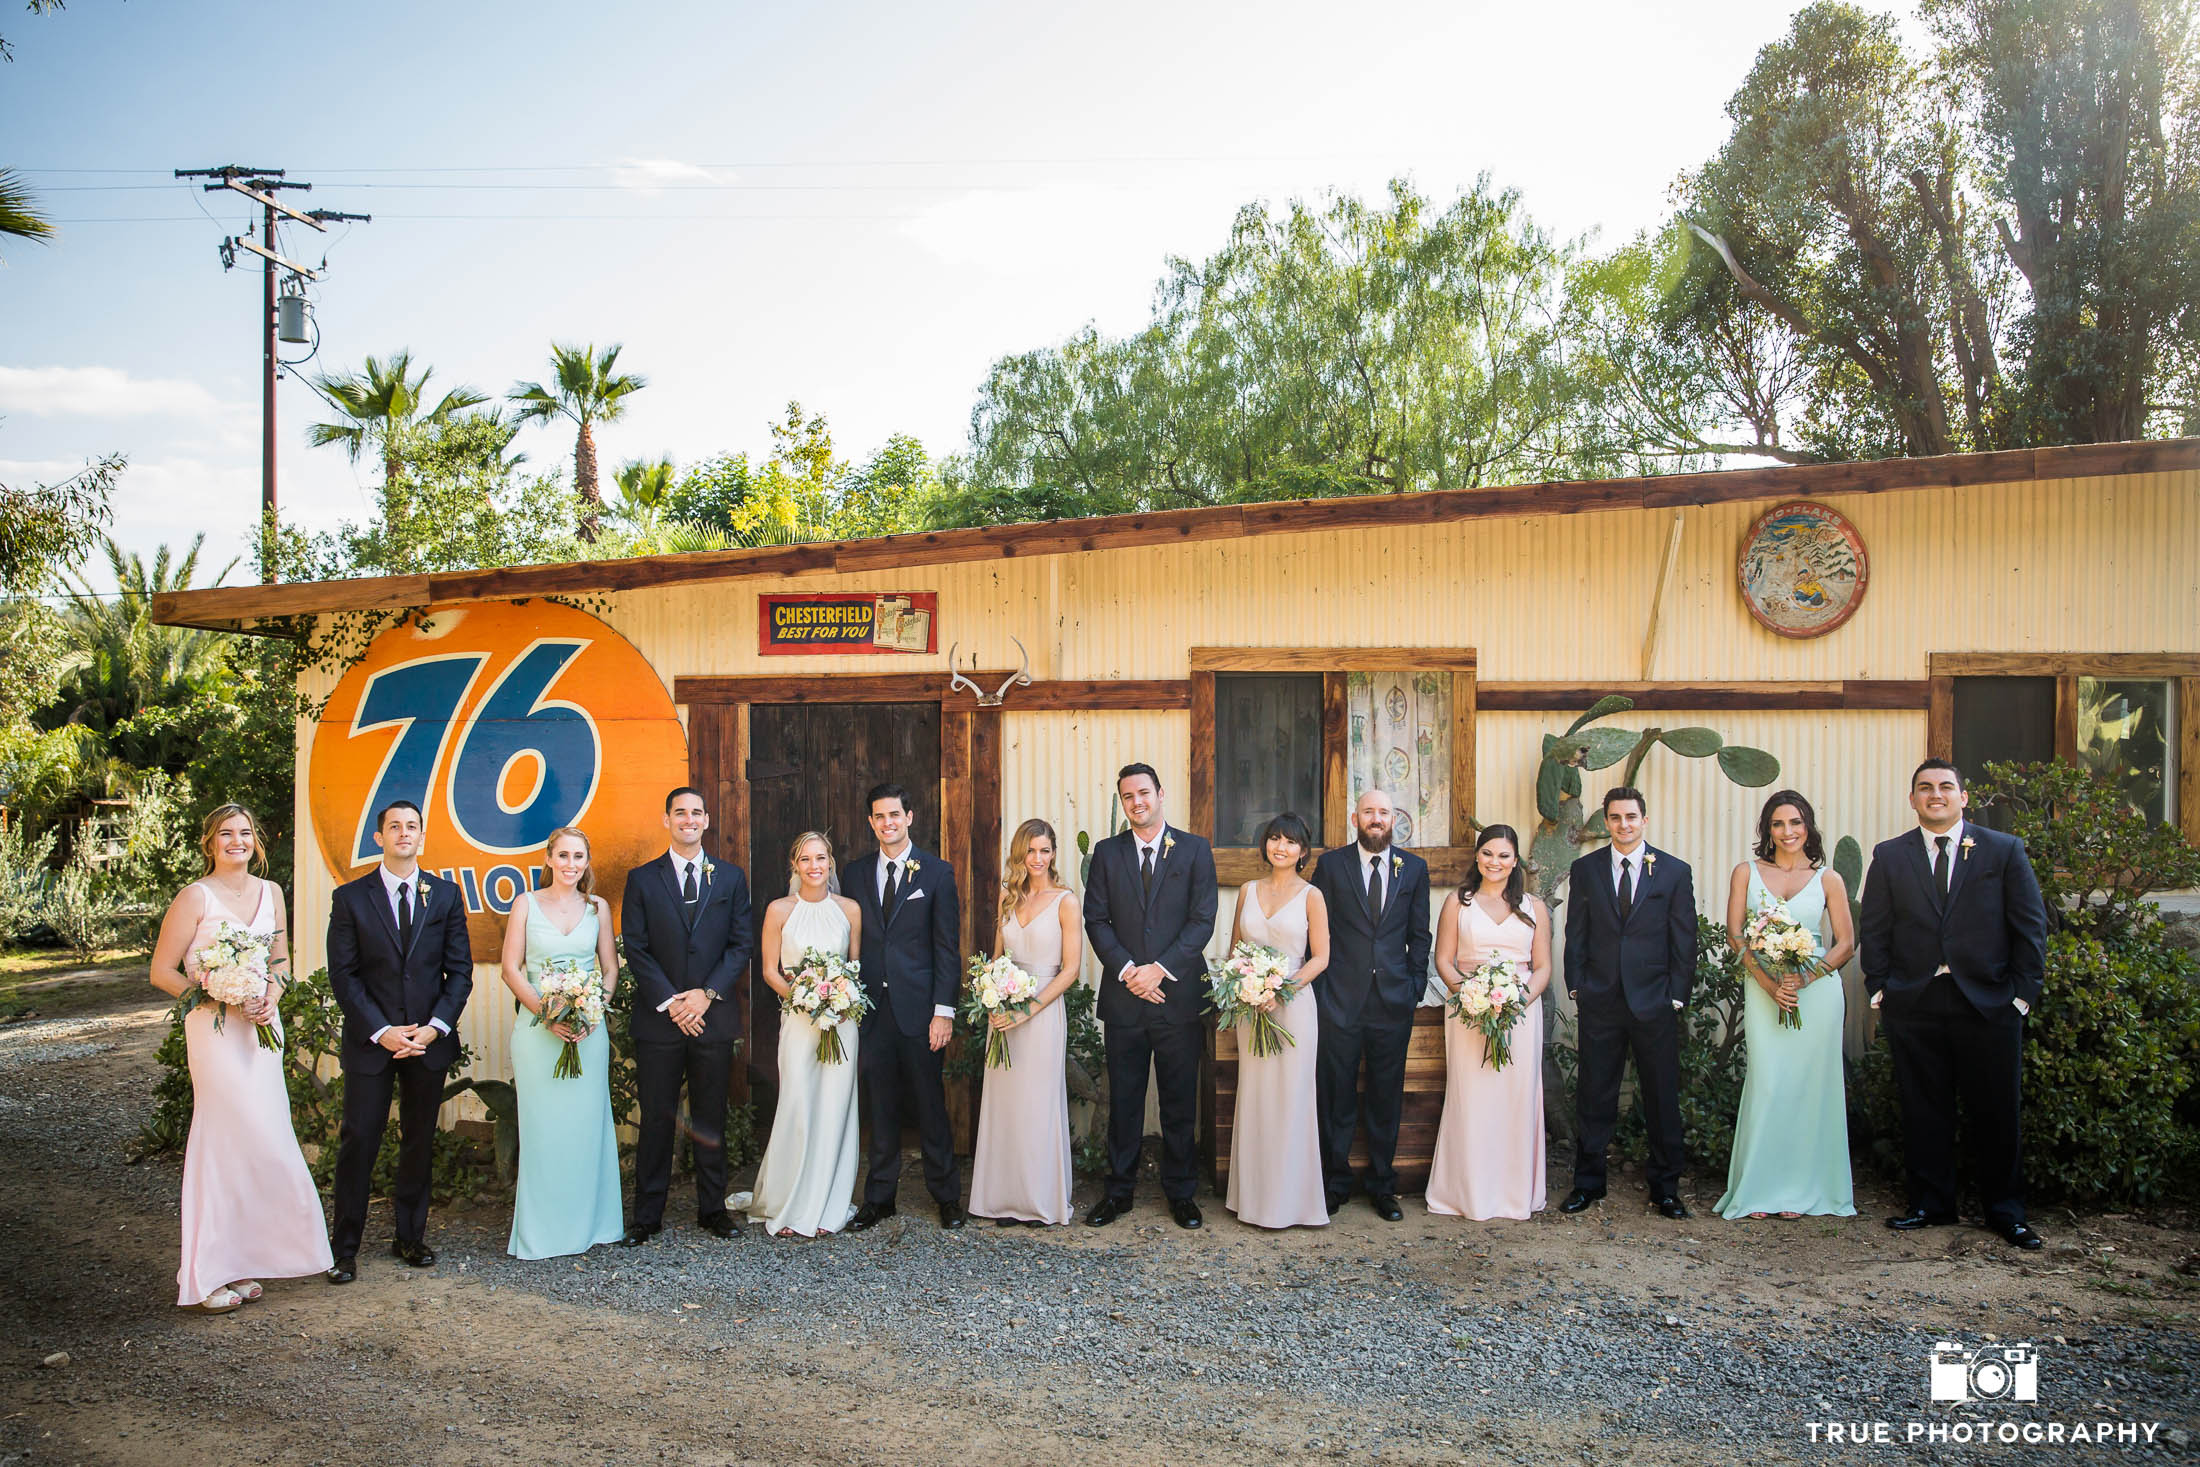 Bohemian modern wedding bridal party outside vintage 76 gas station